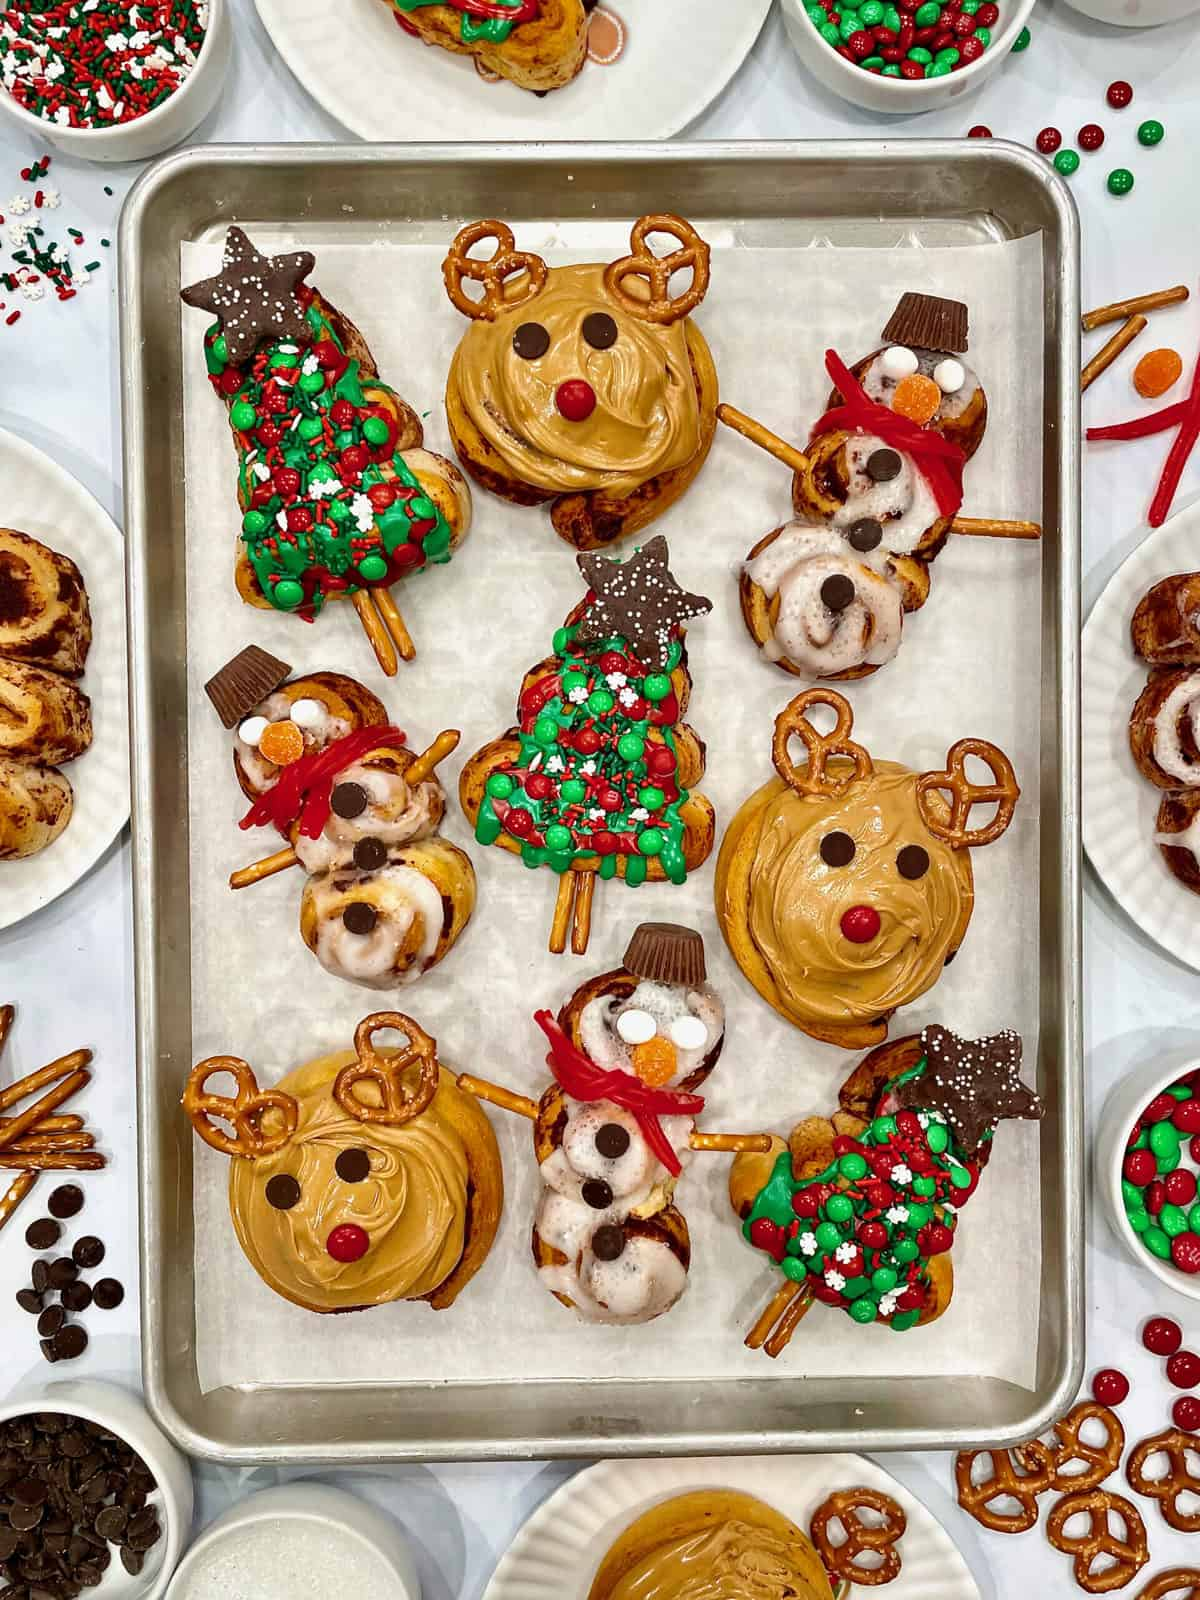 Festive Christmas-Shaped Cinnamon Rolls by The BakerMama